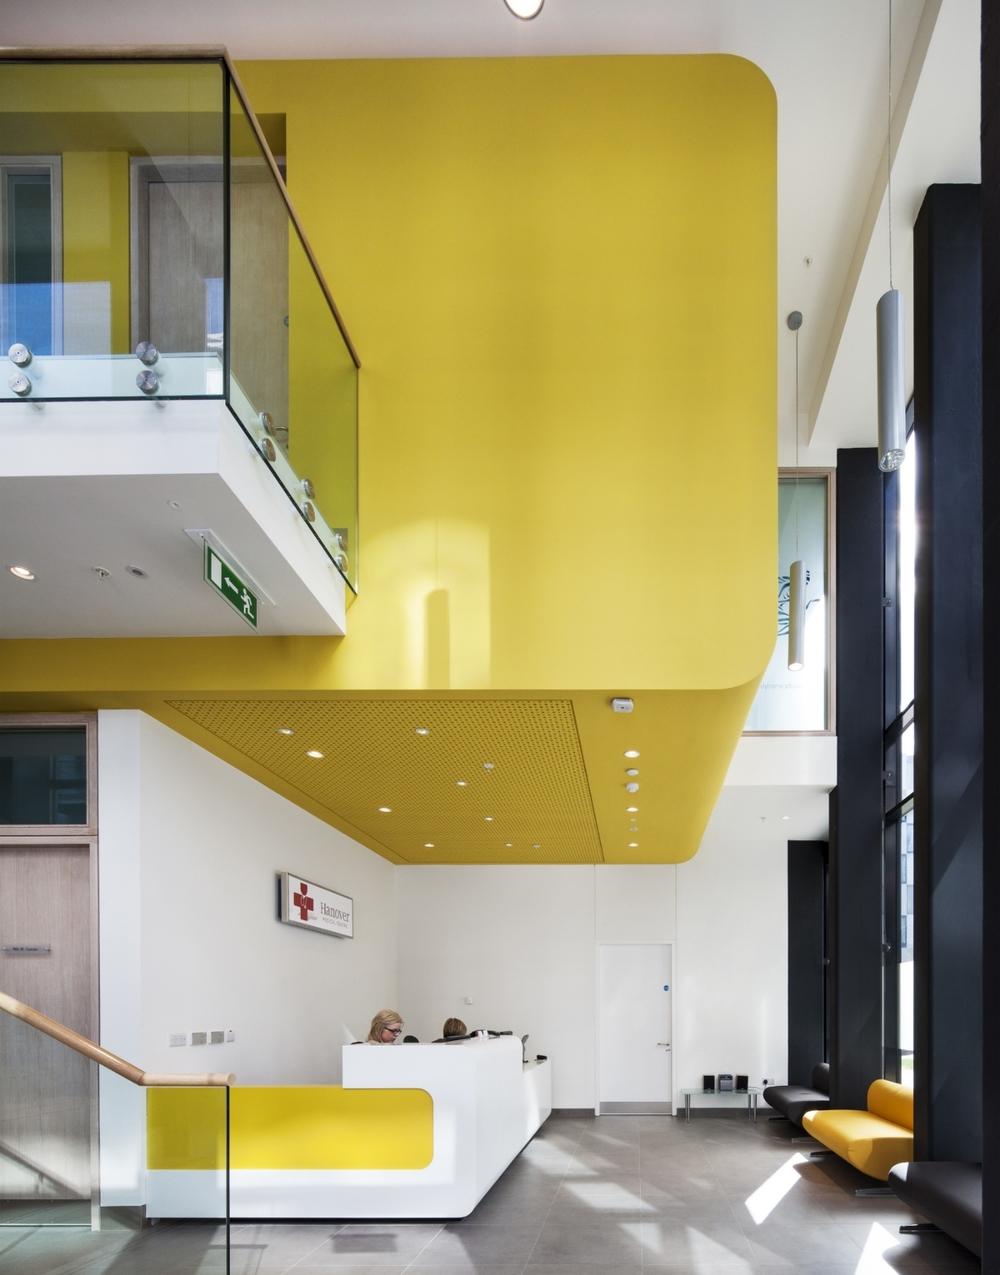 Hanover Medial Centre